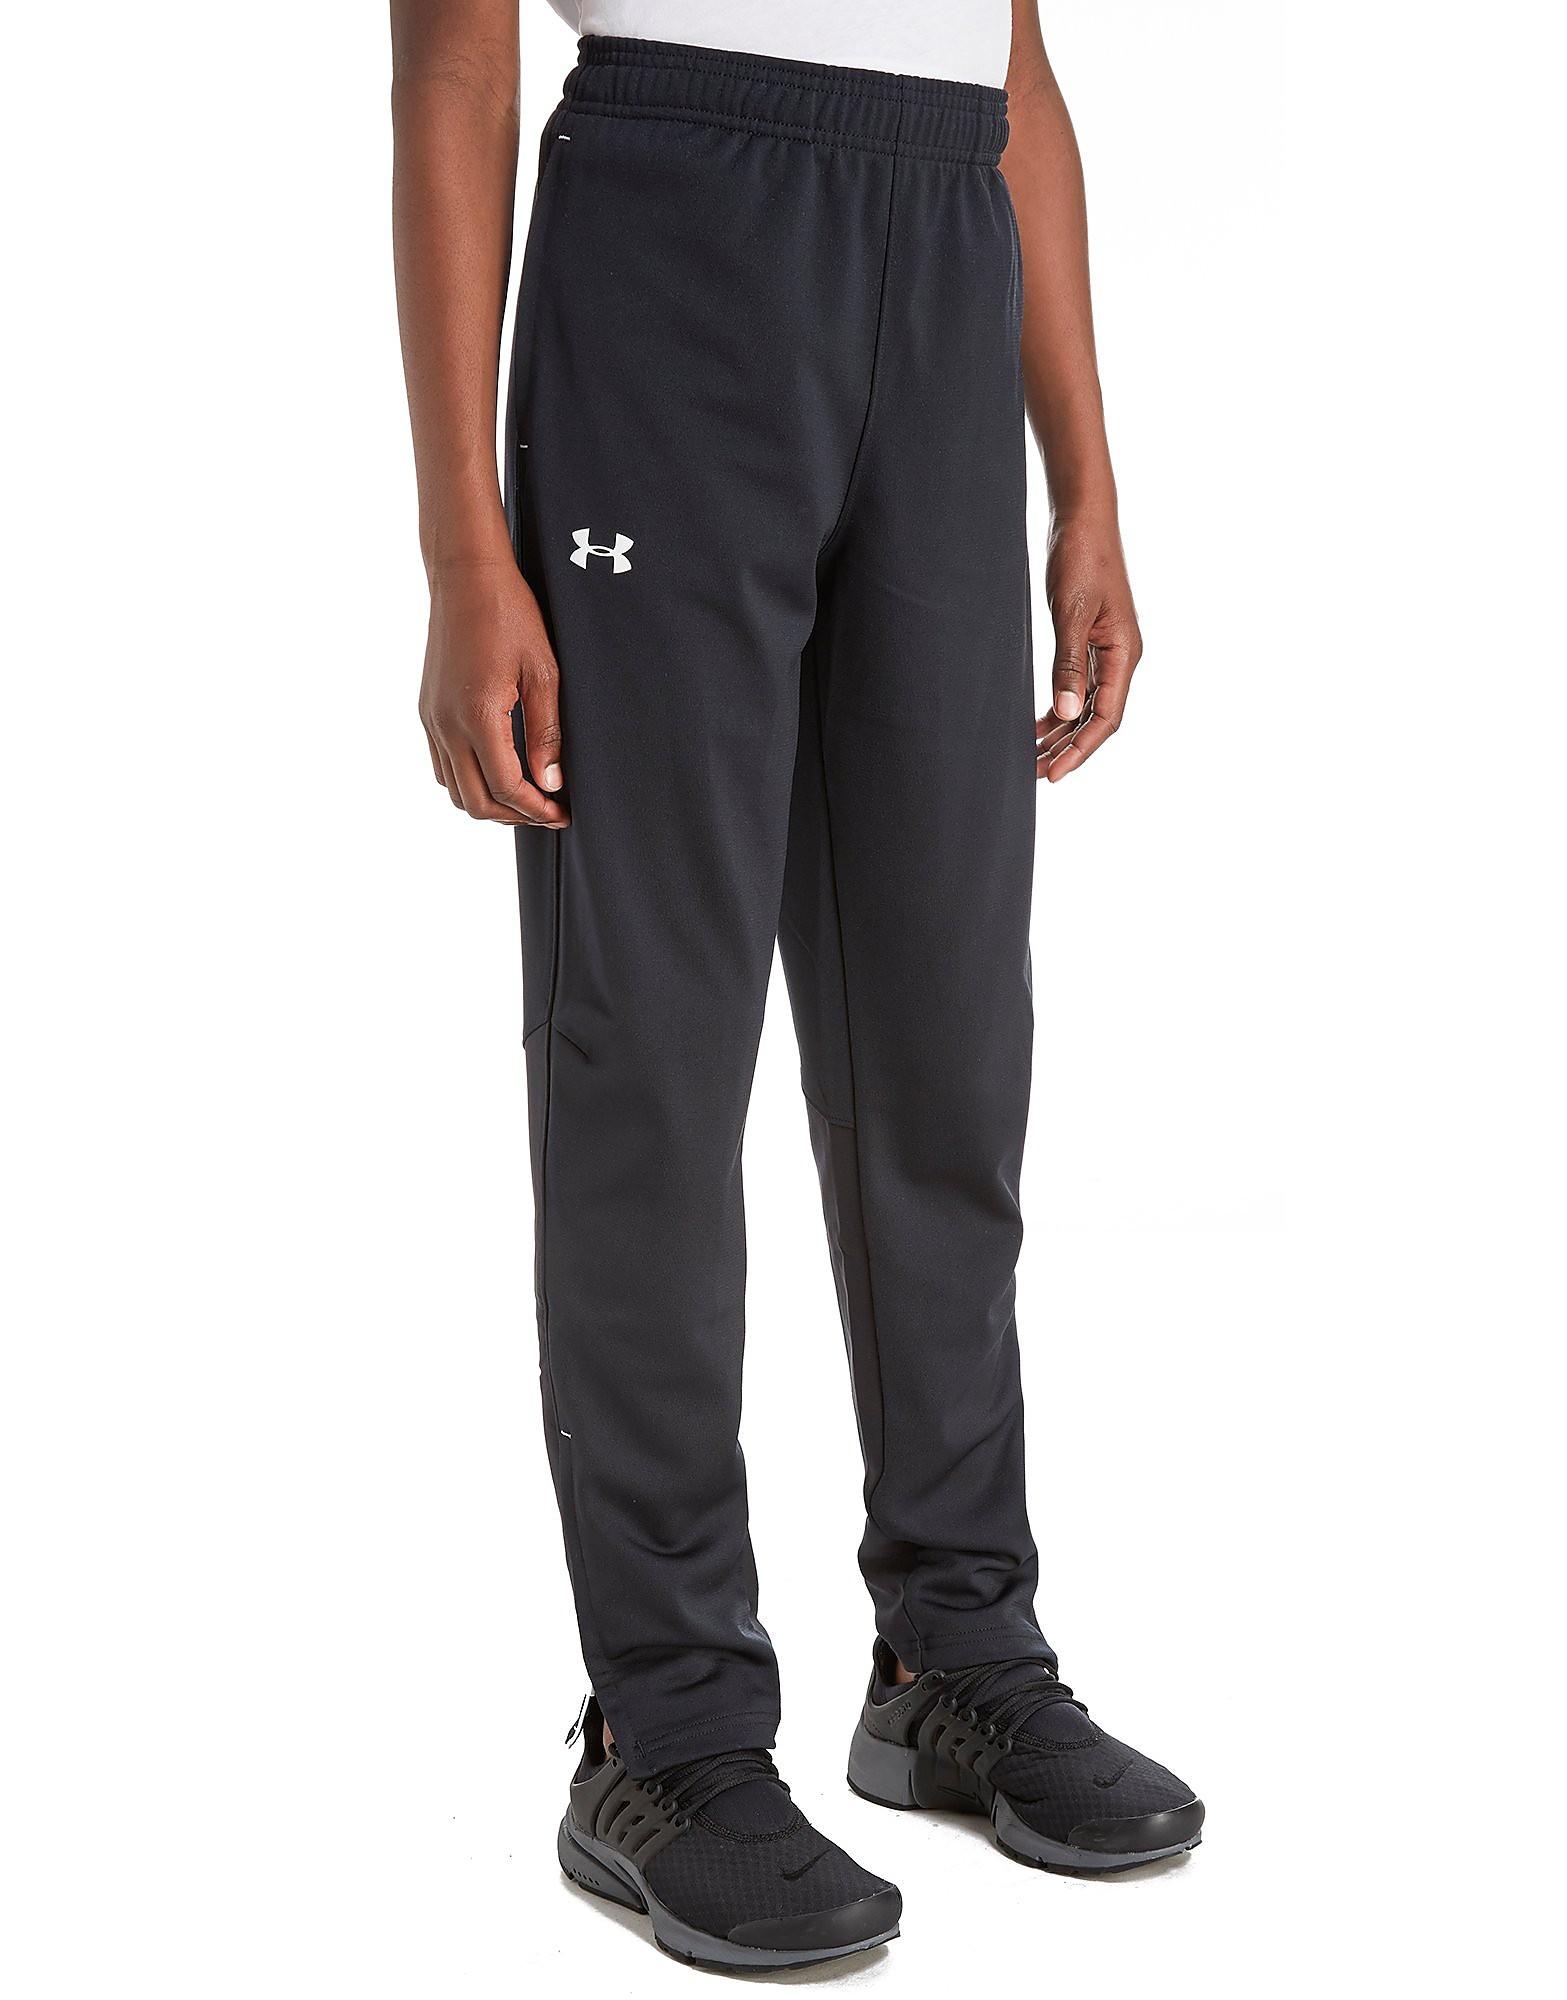 Under Armour Challenger Knit Pants Junior